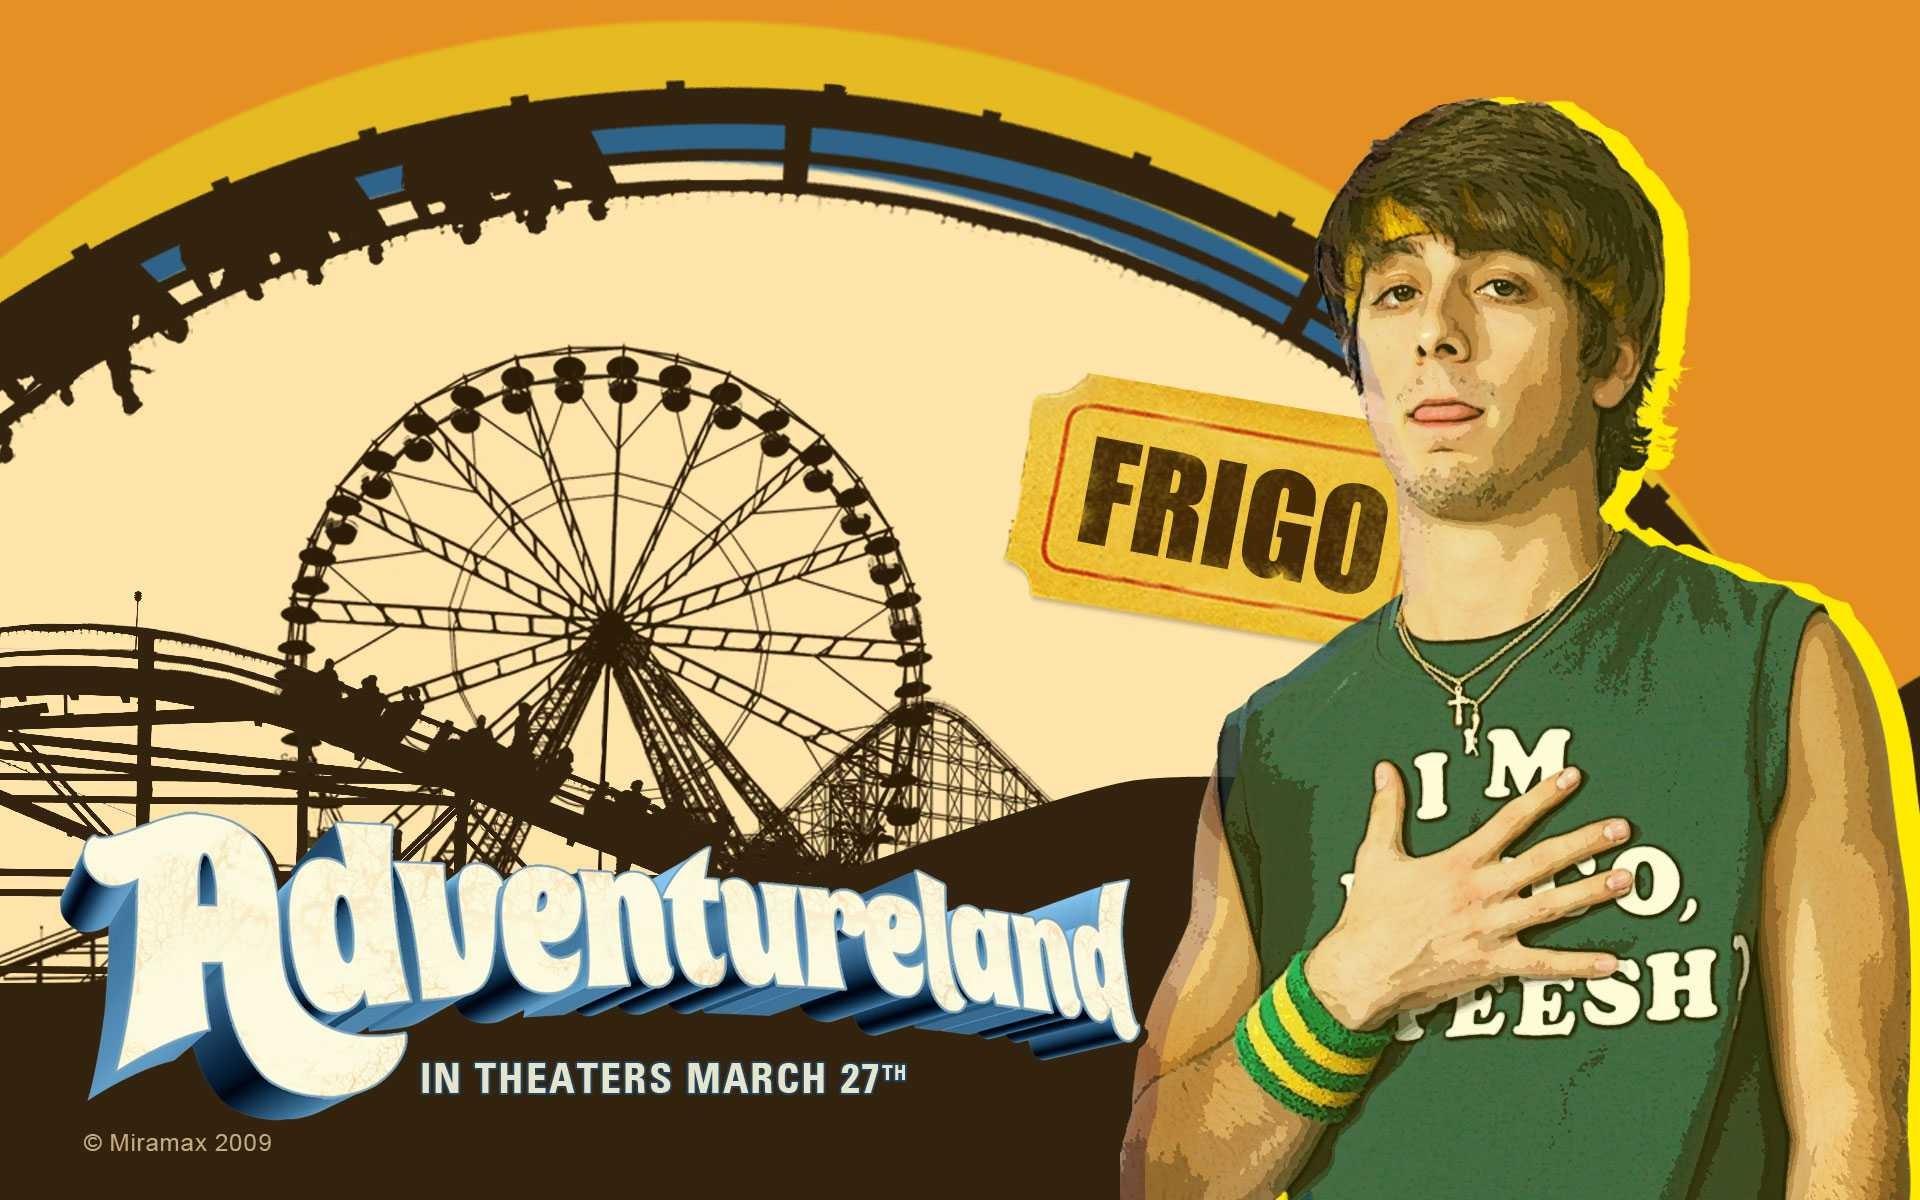 Un wallpaper del film Adventureland con Matt Bush